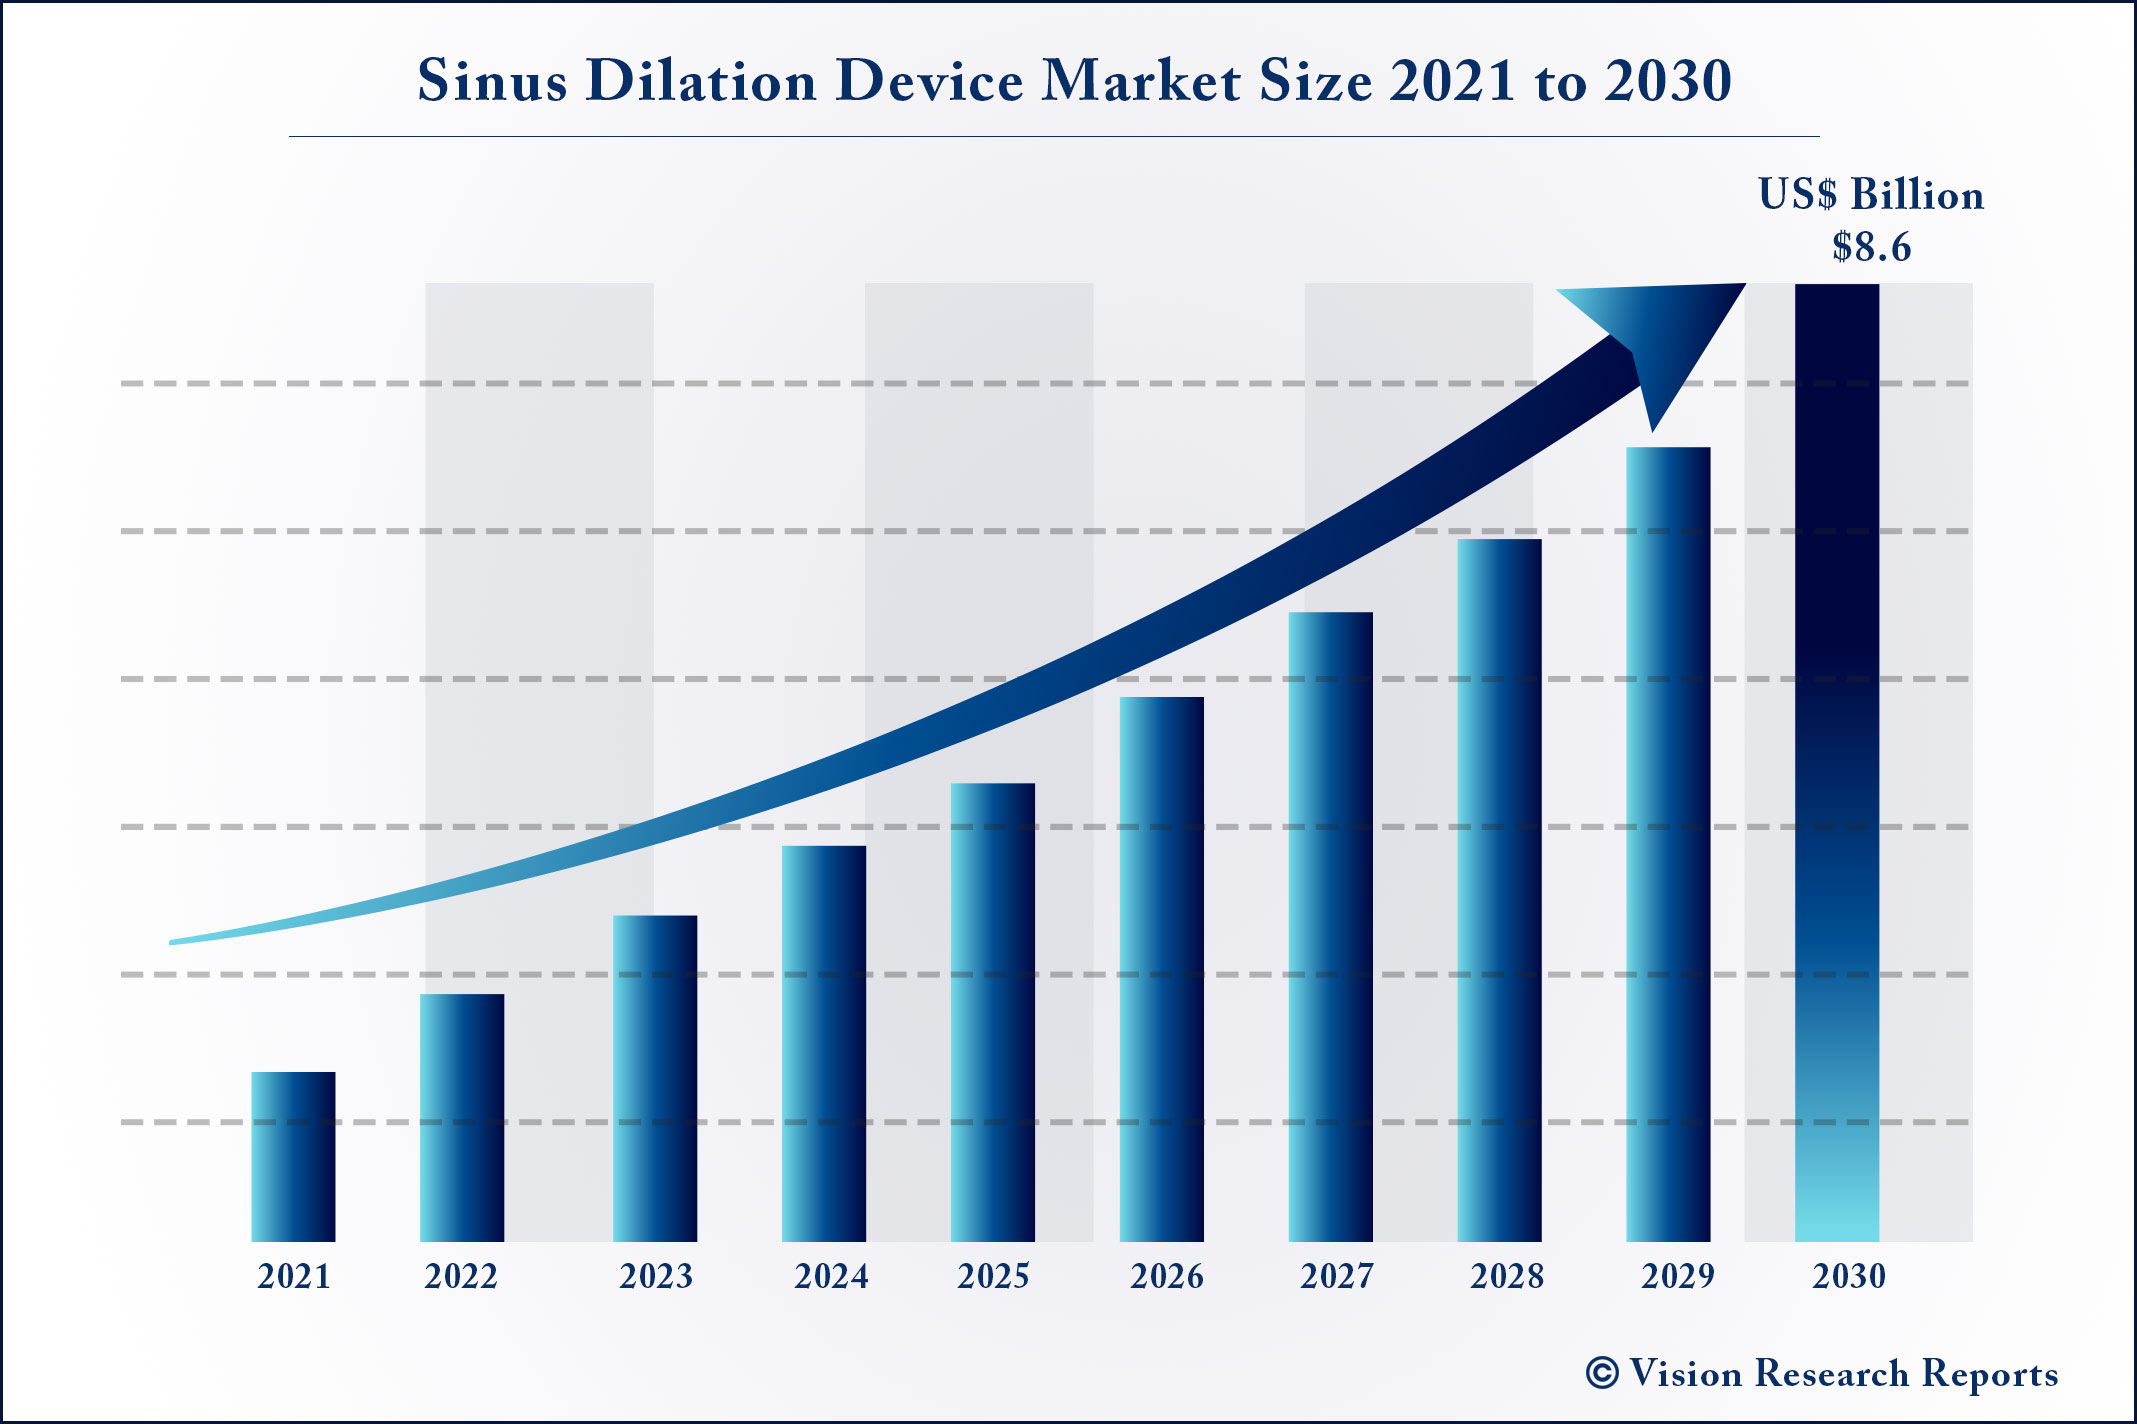 Sinus Dilation Device Market Size 2021 to 2030